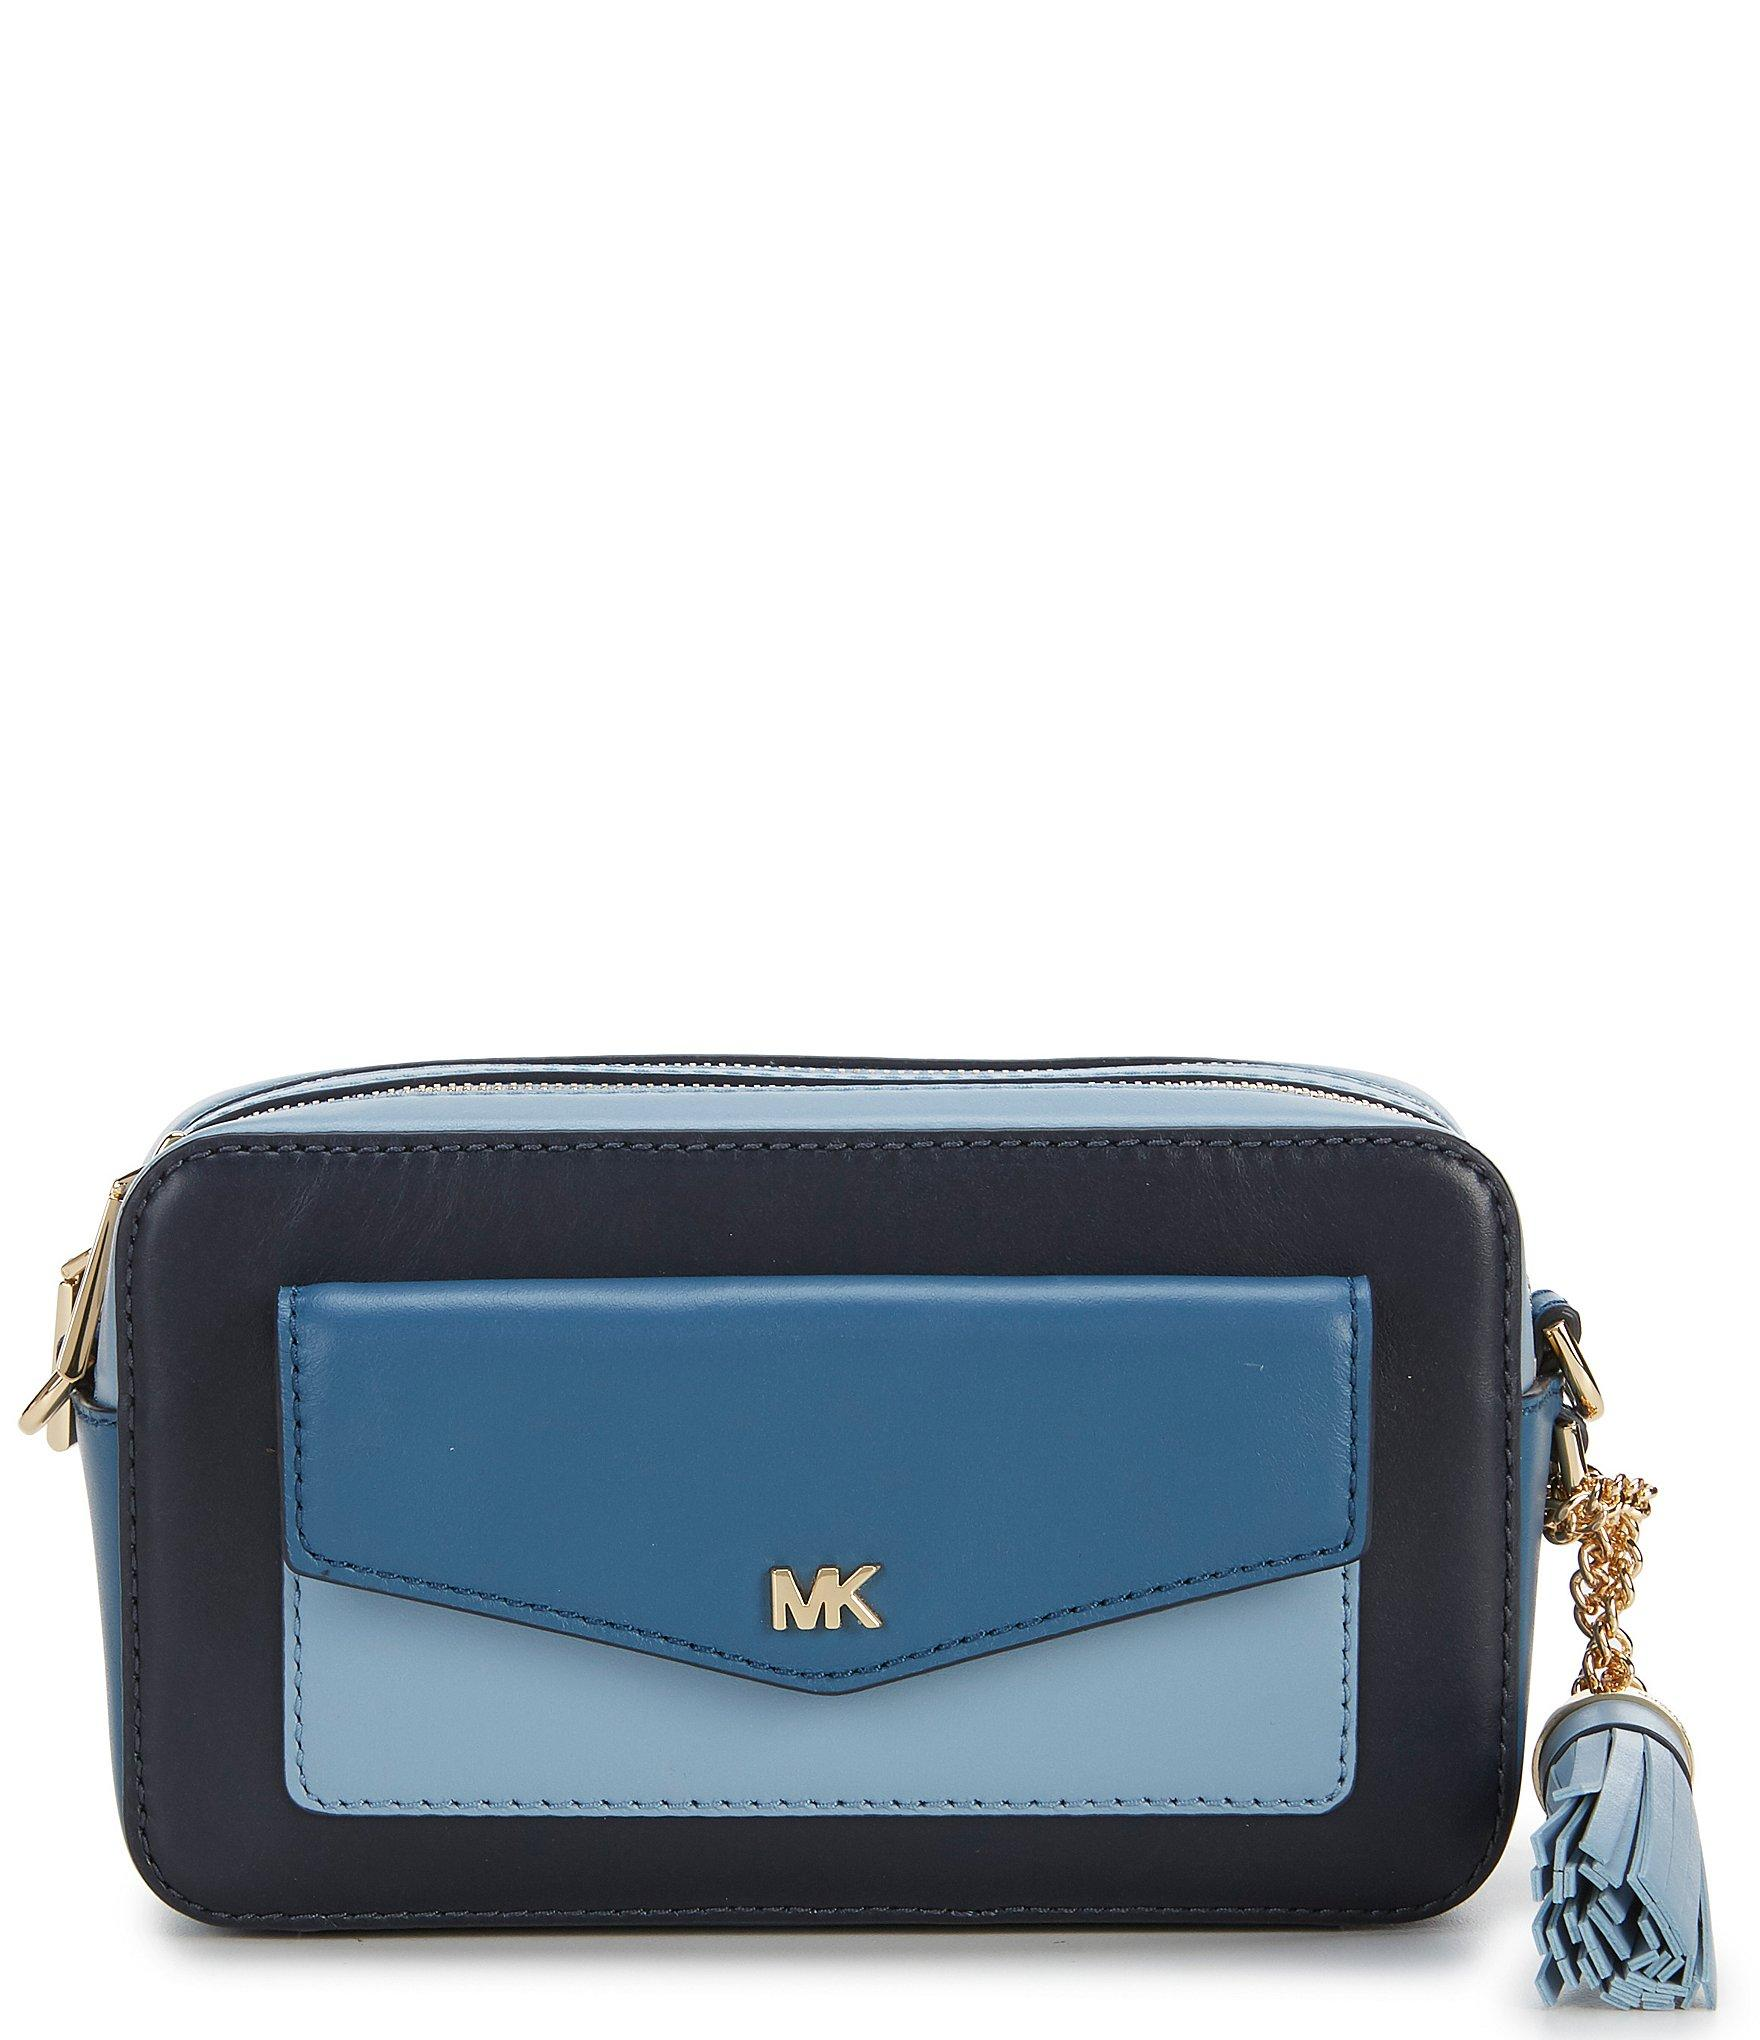 271546c03542 MICHAEL Michael Kors. Women s Blue Small Tri-color Pocket Camera Cross-body  Bag